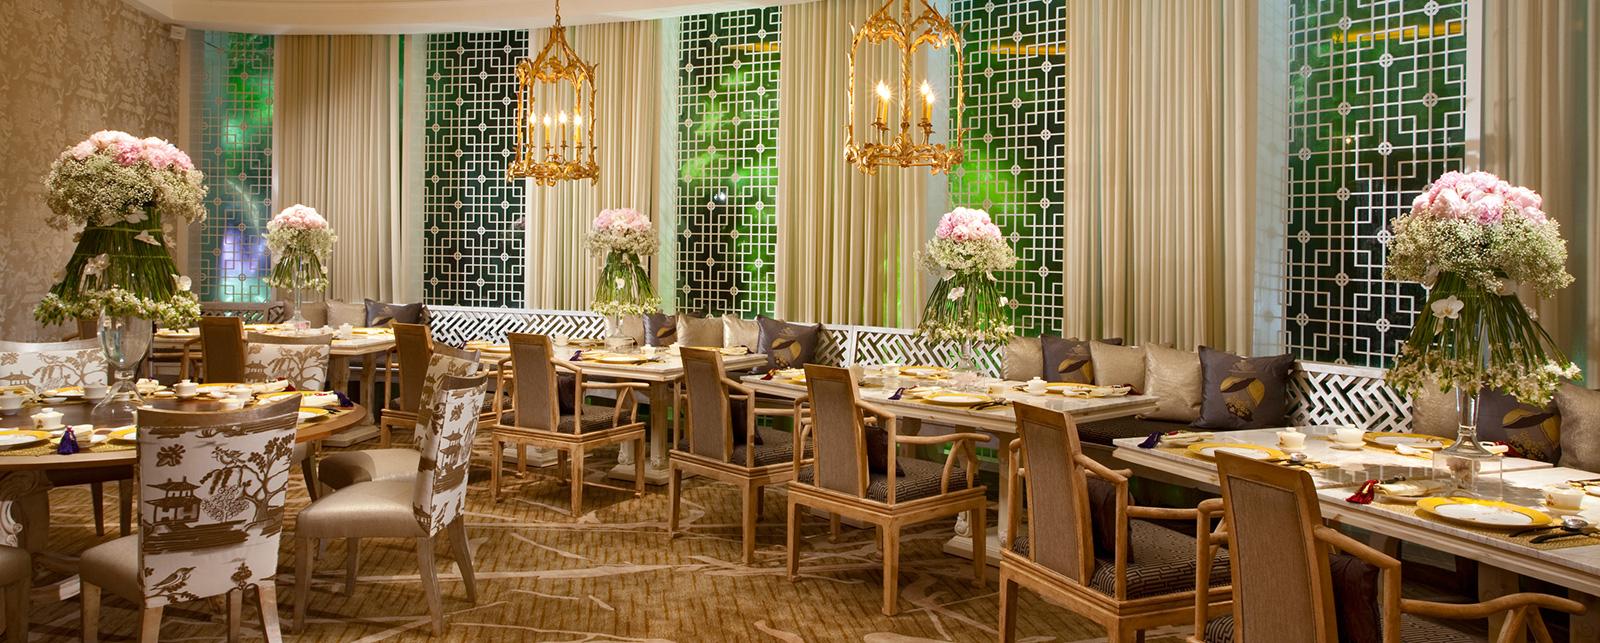 table8_hotel_mulia_jakarta_37.jpg